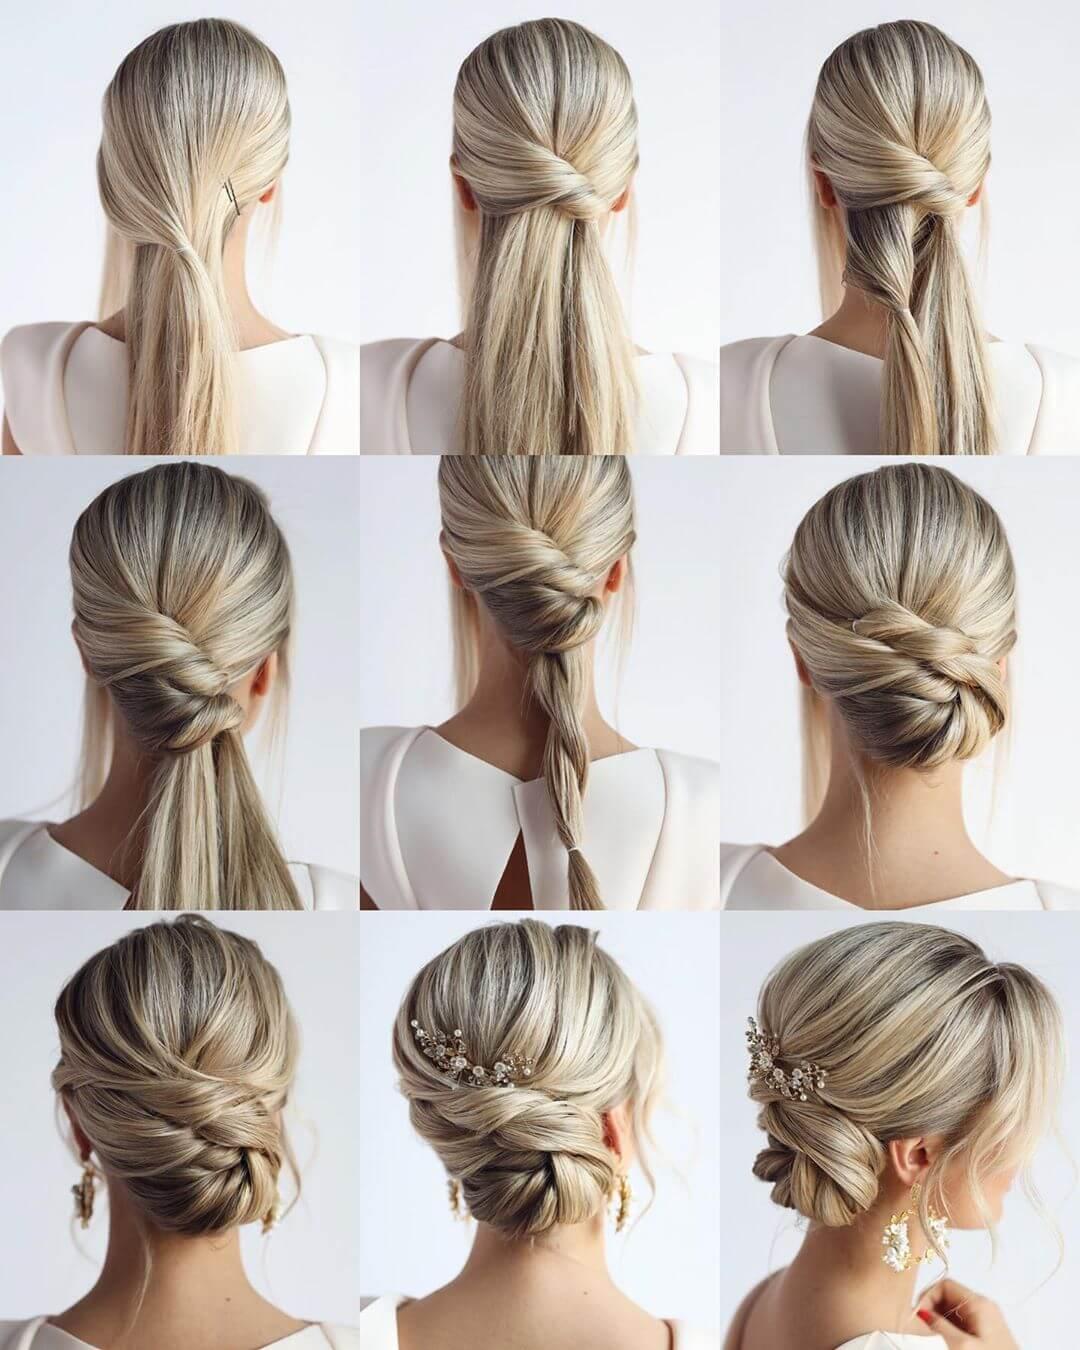 Step by Step Twist bridal bun Hairstyles for Long, Medium, Short Hair